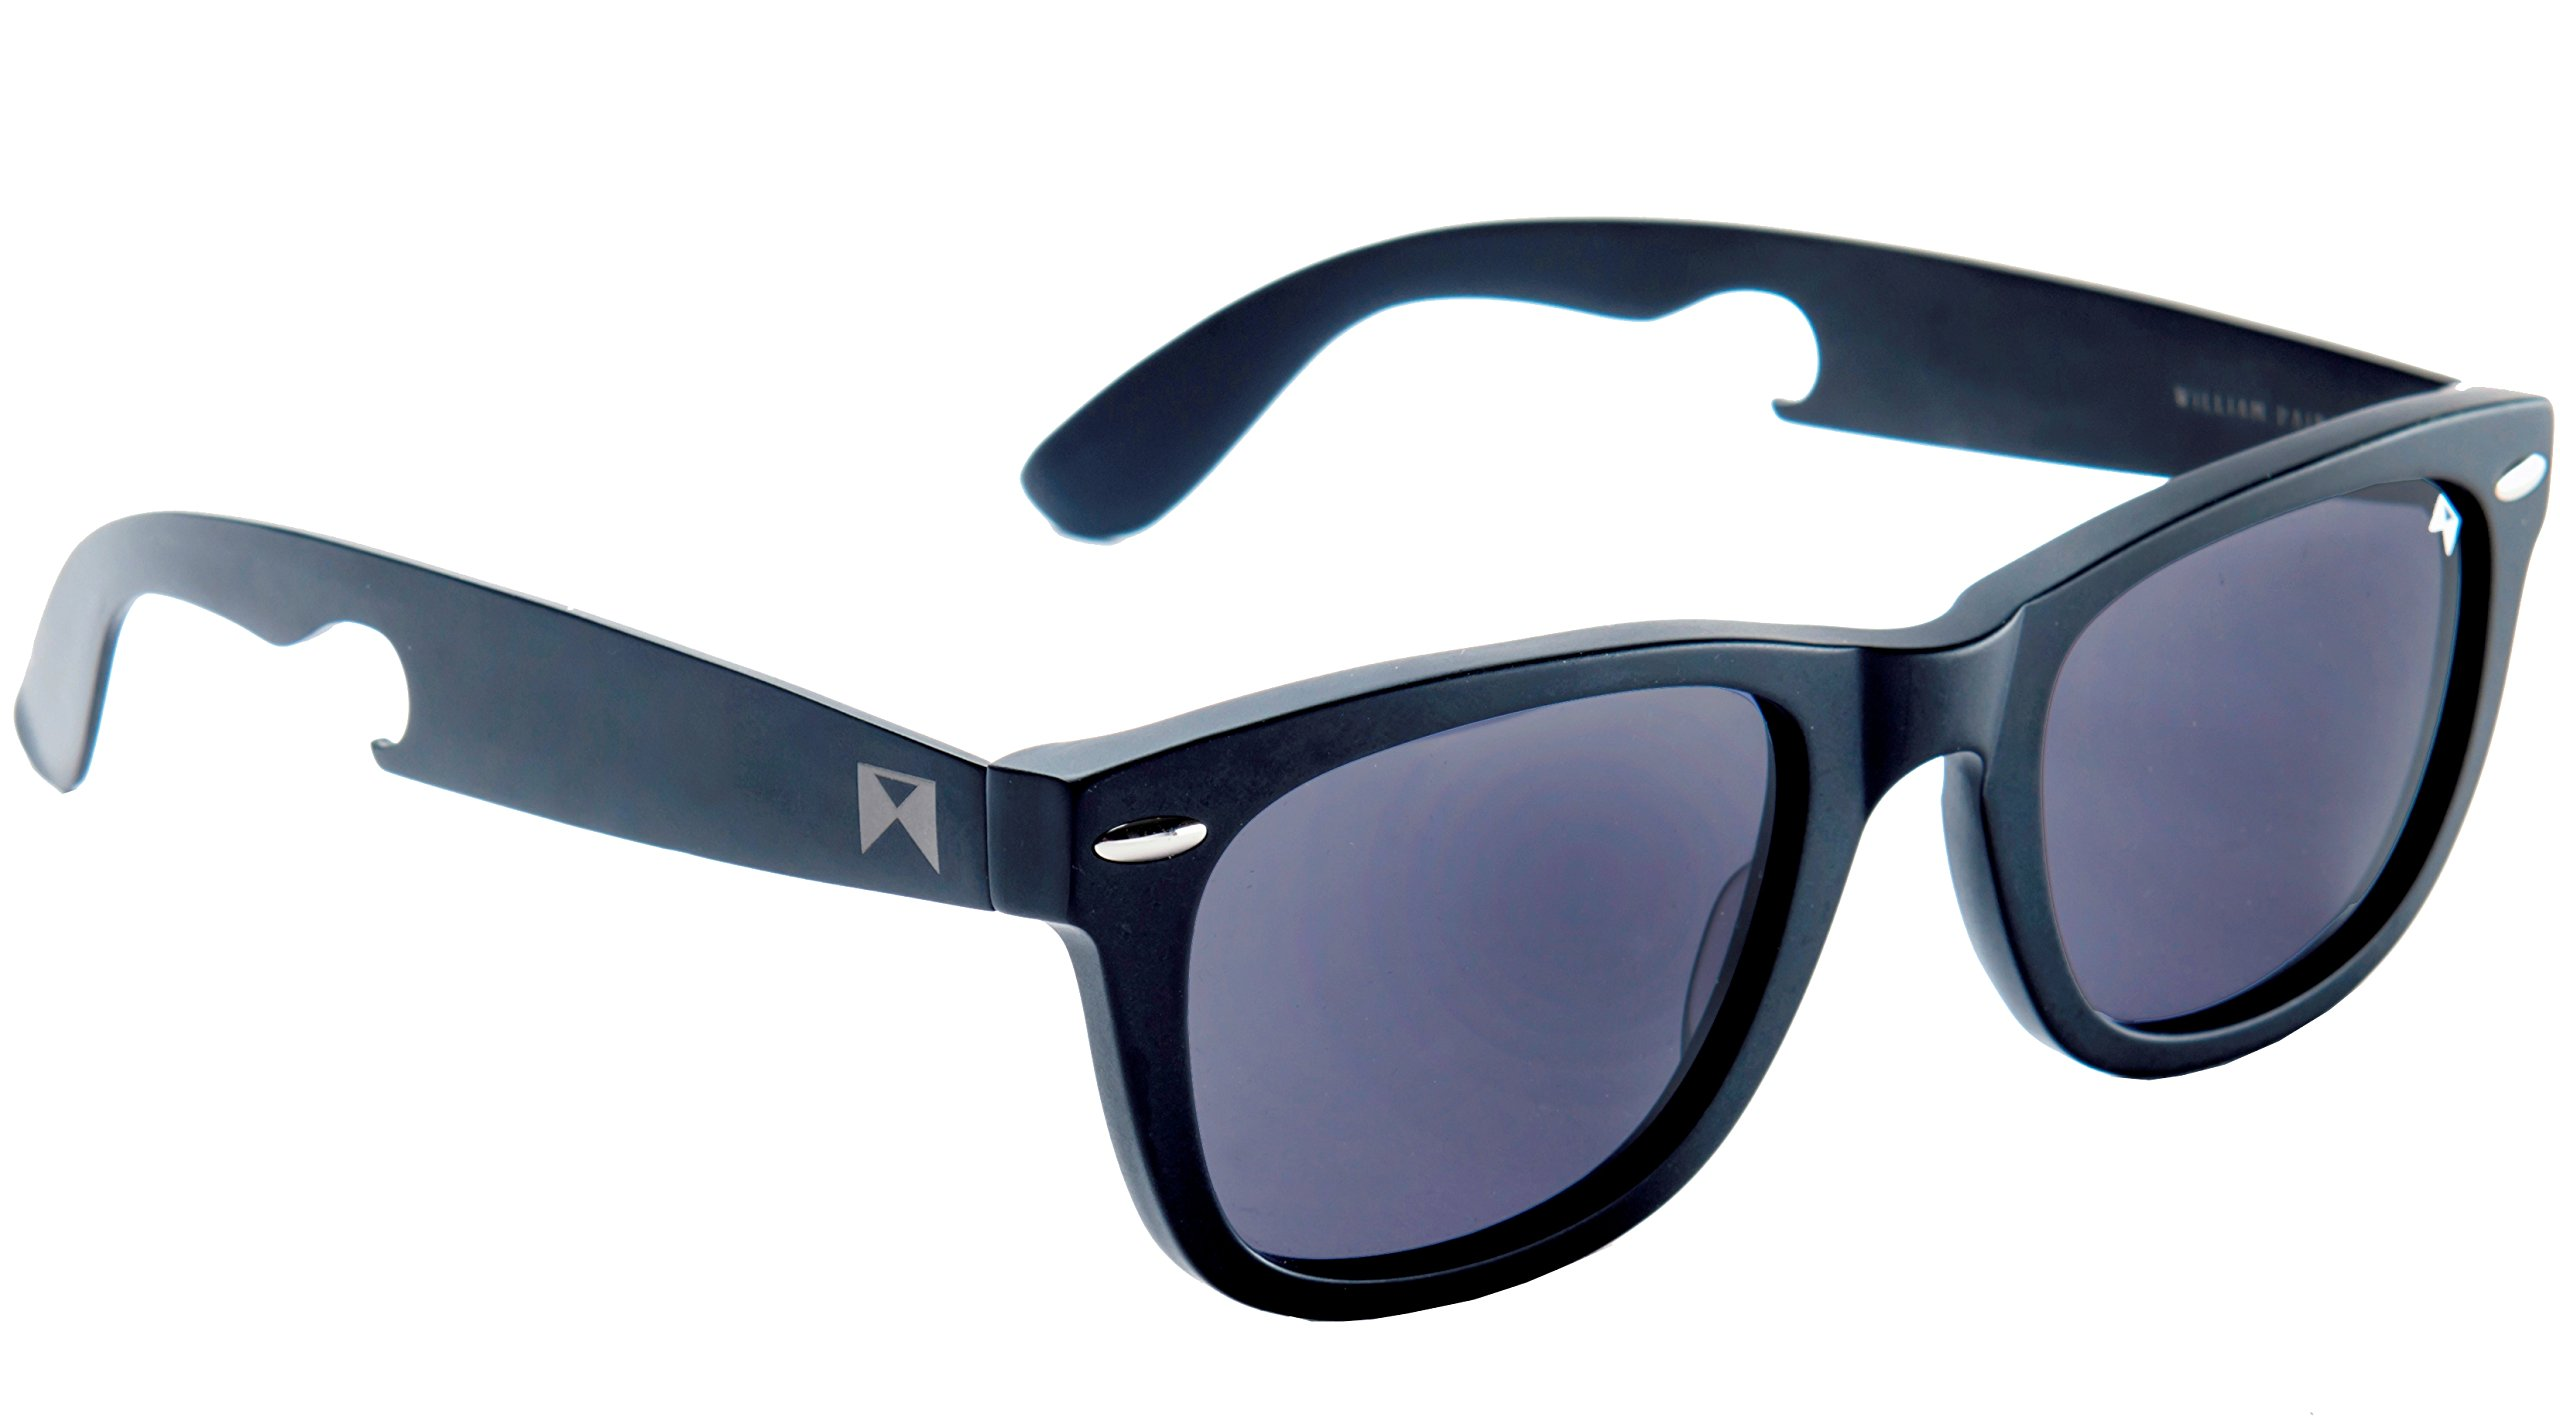 William Painter - The Hook Titanium Polarized Wayfarer Sunglasses